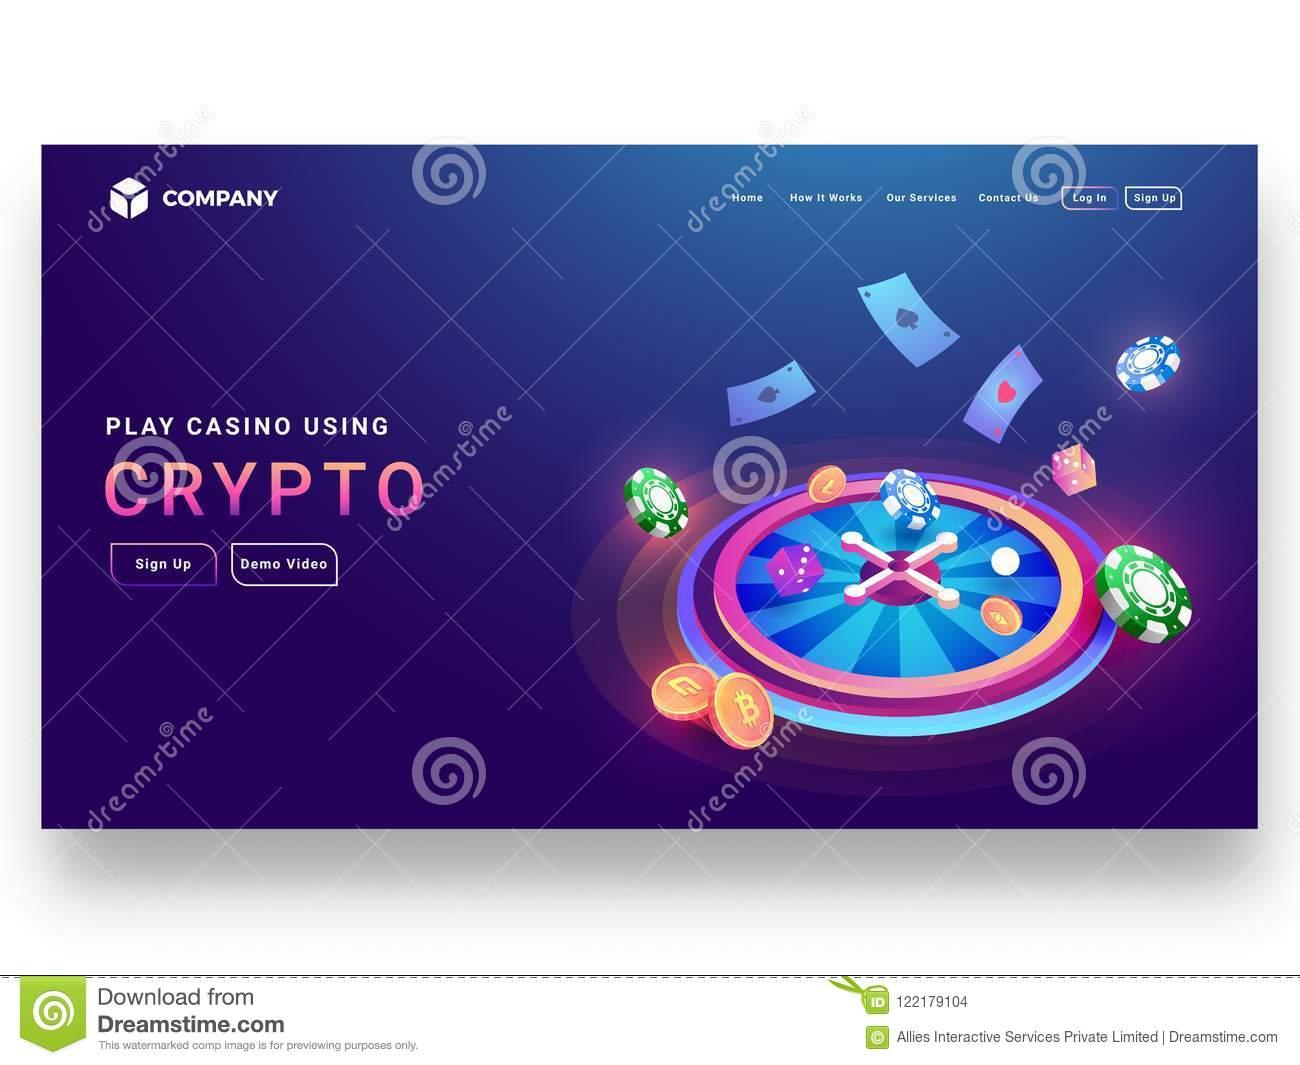 Pelaa peli earn crypto